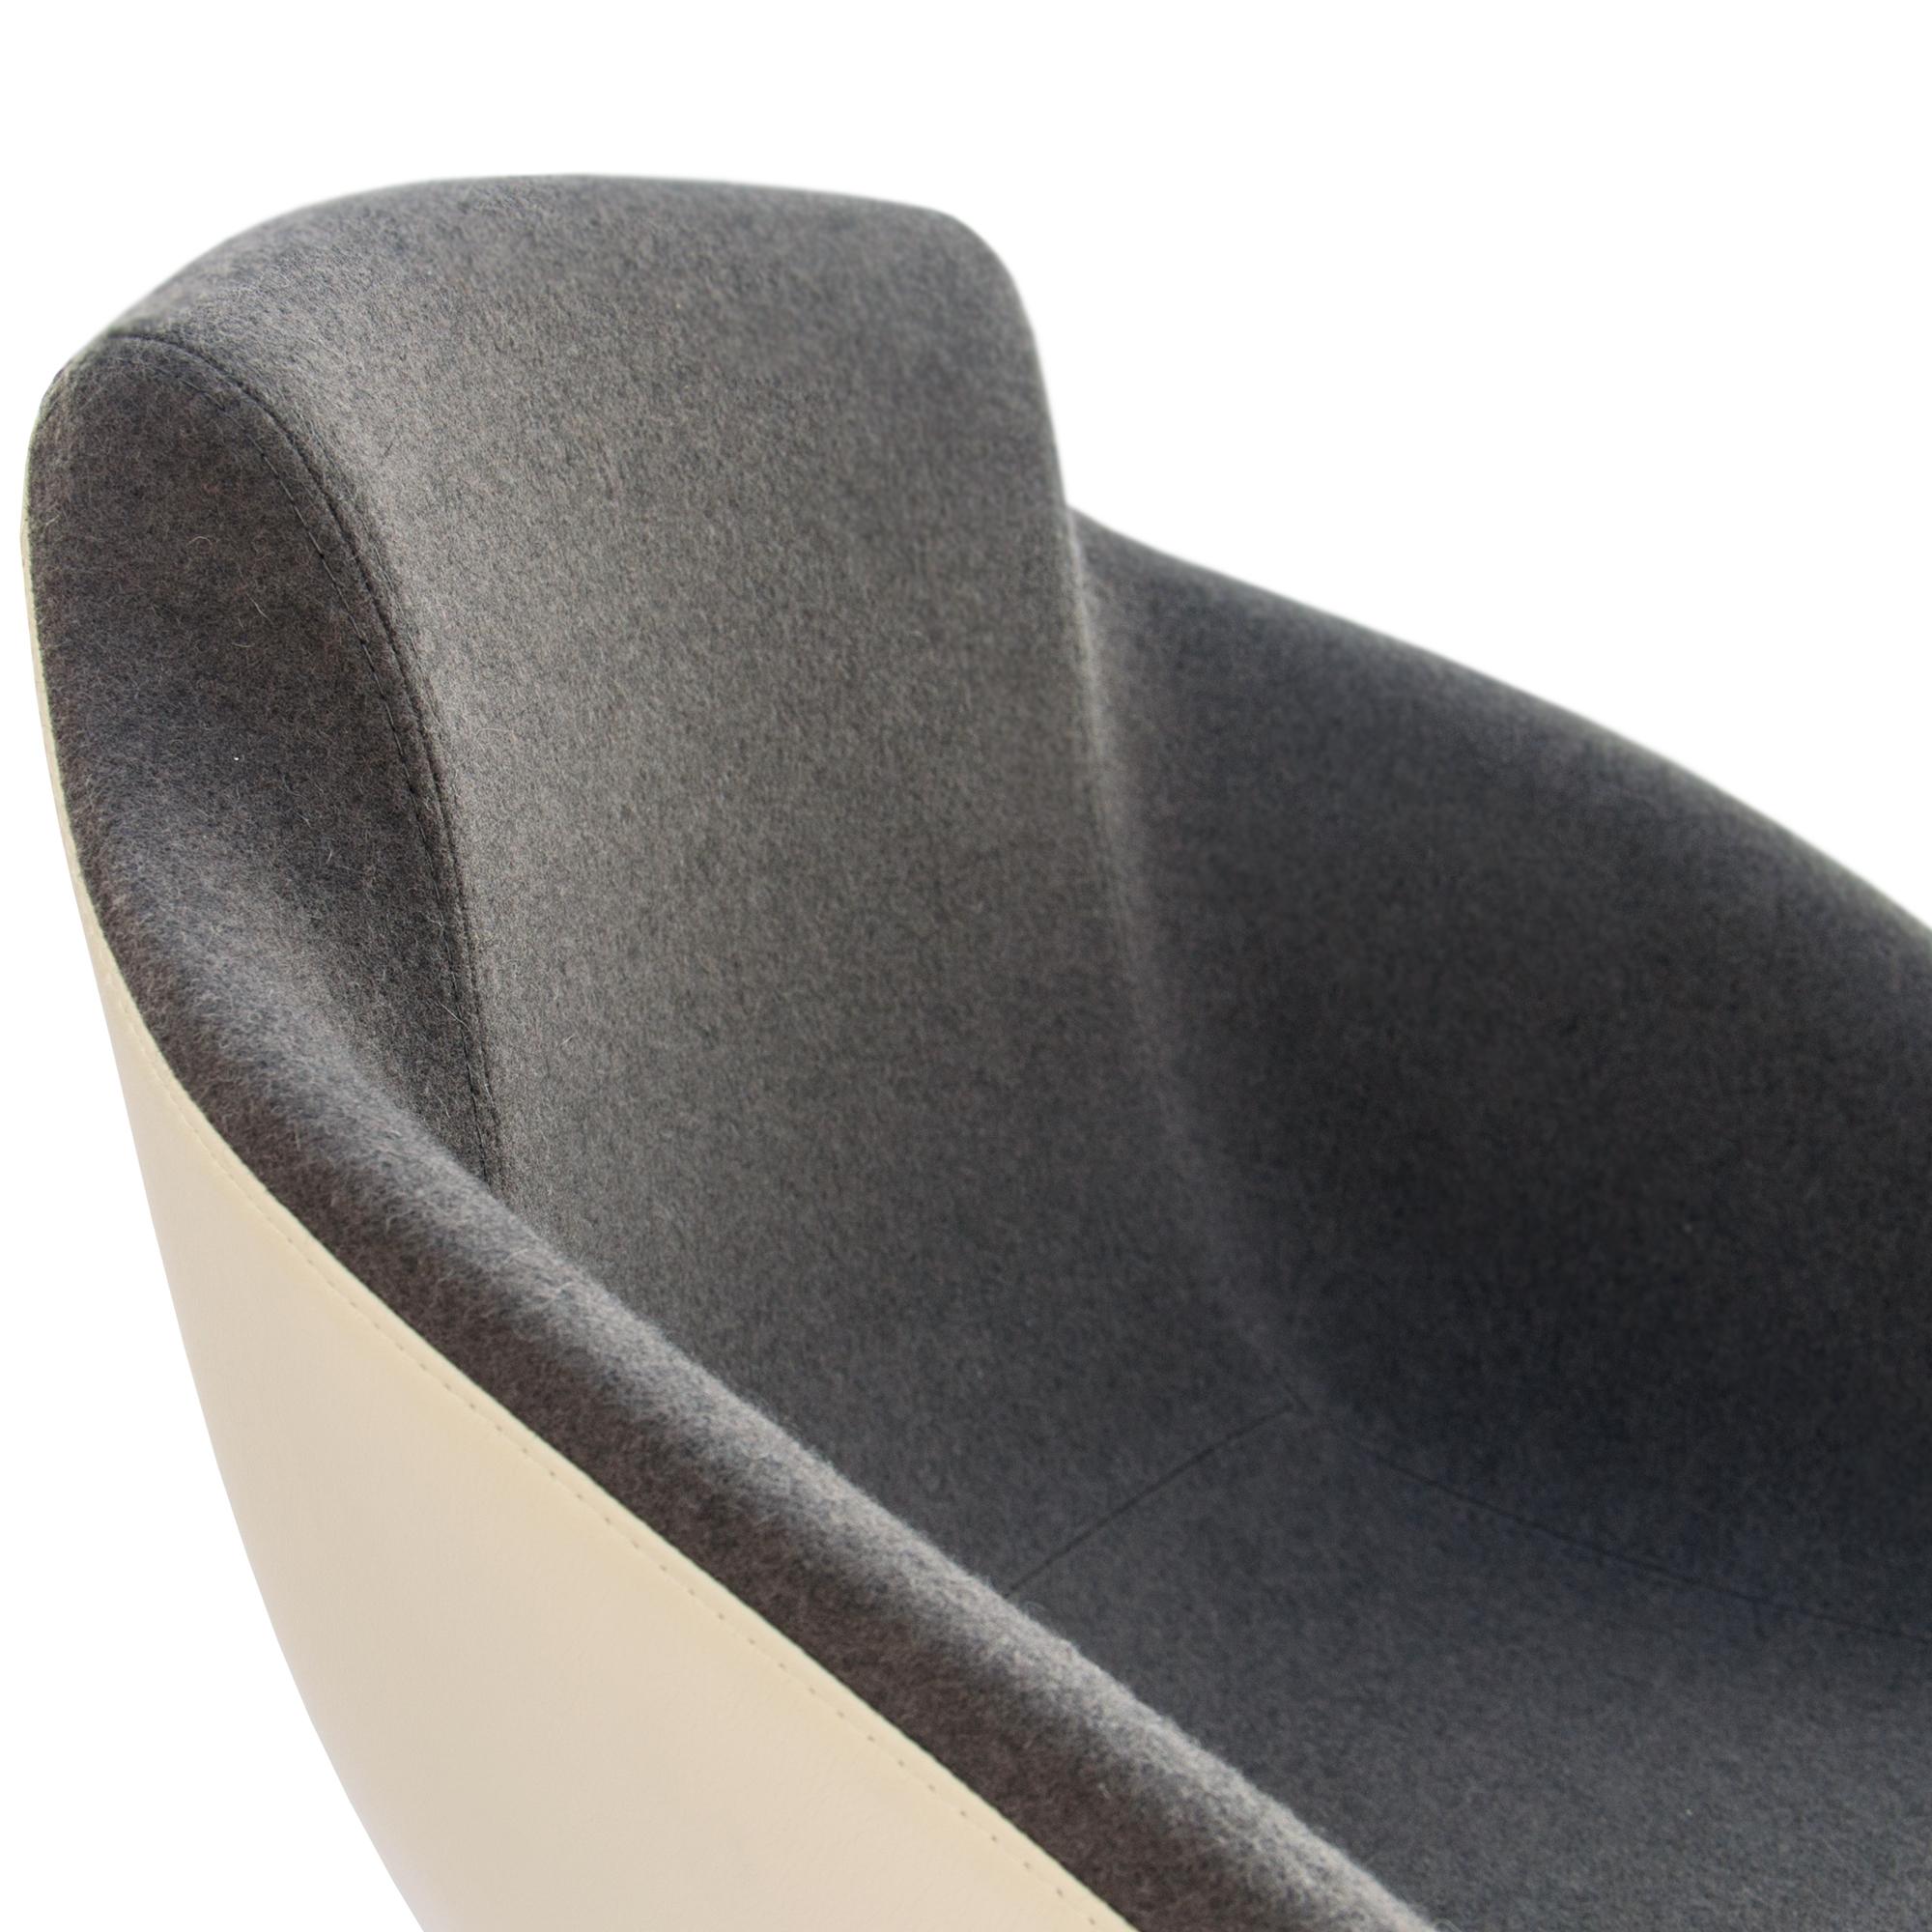 Loungesessel TULA auf Rollen in Kunstleder Sessel Stuhl Hocker